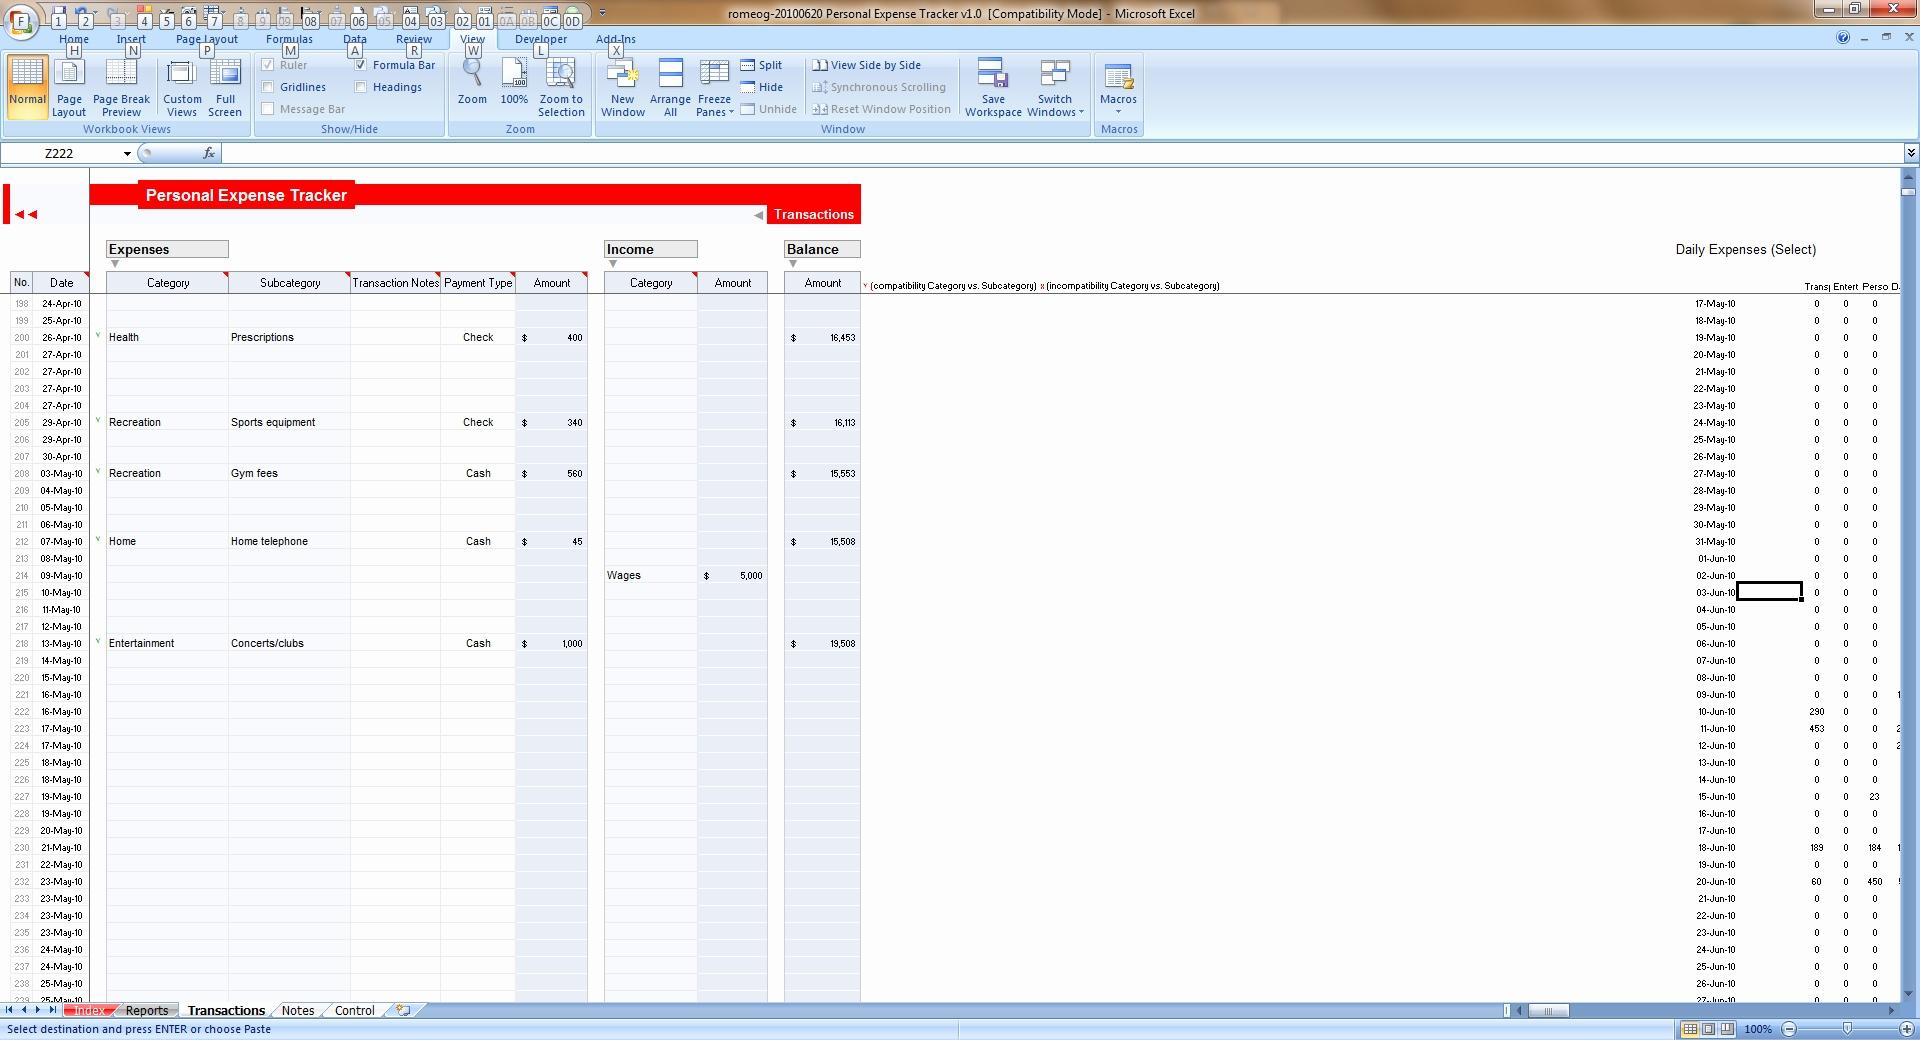 Personal Spending Tracker Spreadsheet In Expense Tracker Spreadsheet Debt Stackingl Awesome Europeipsleep Of